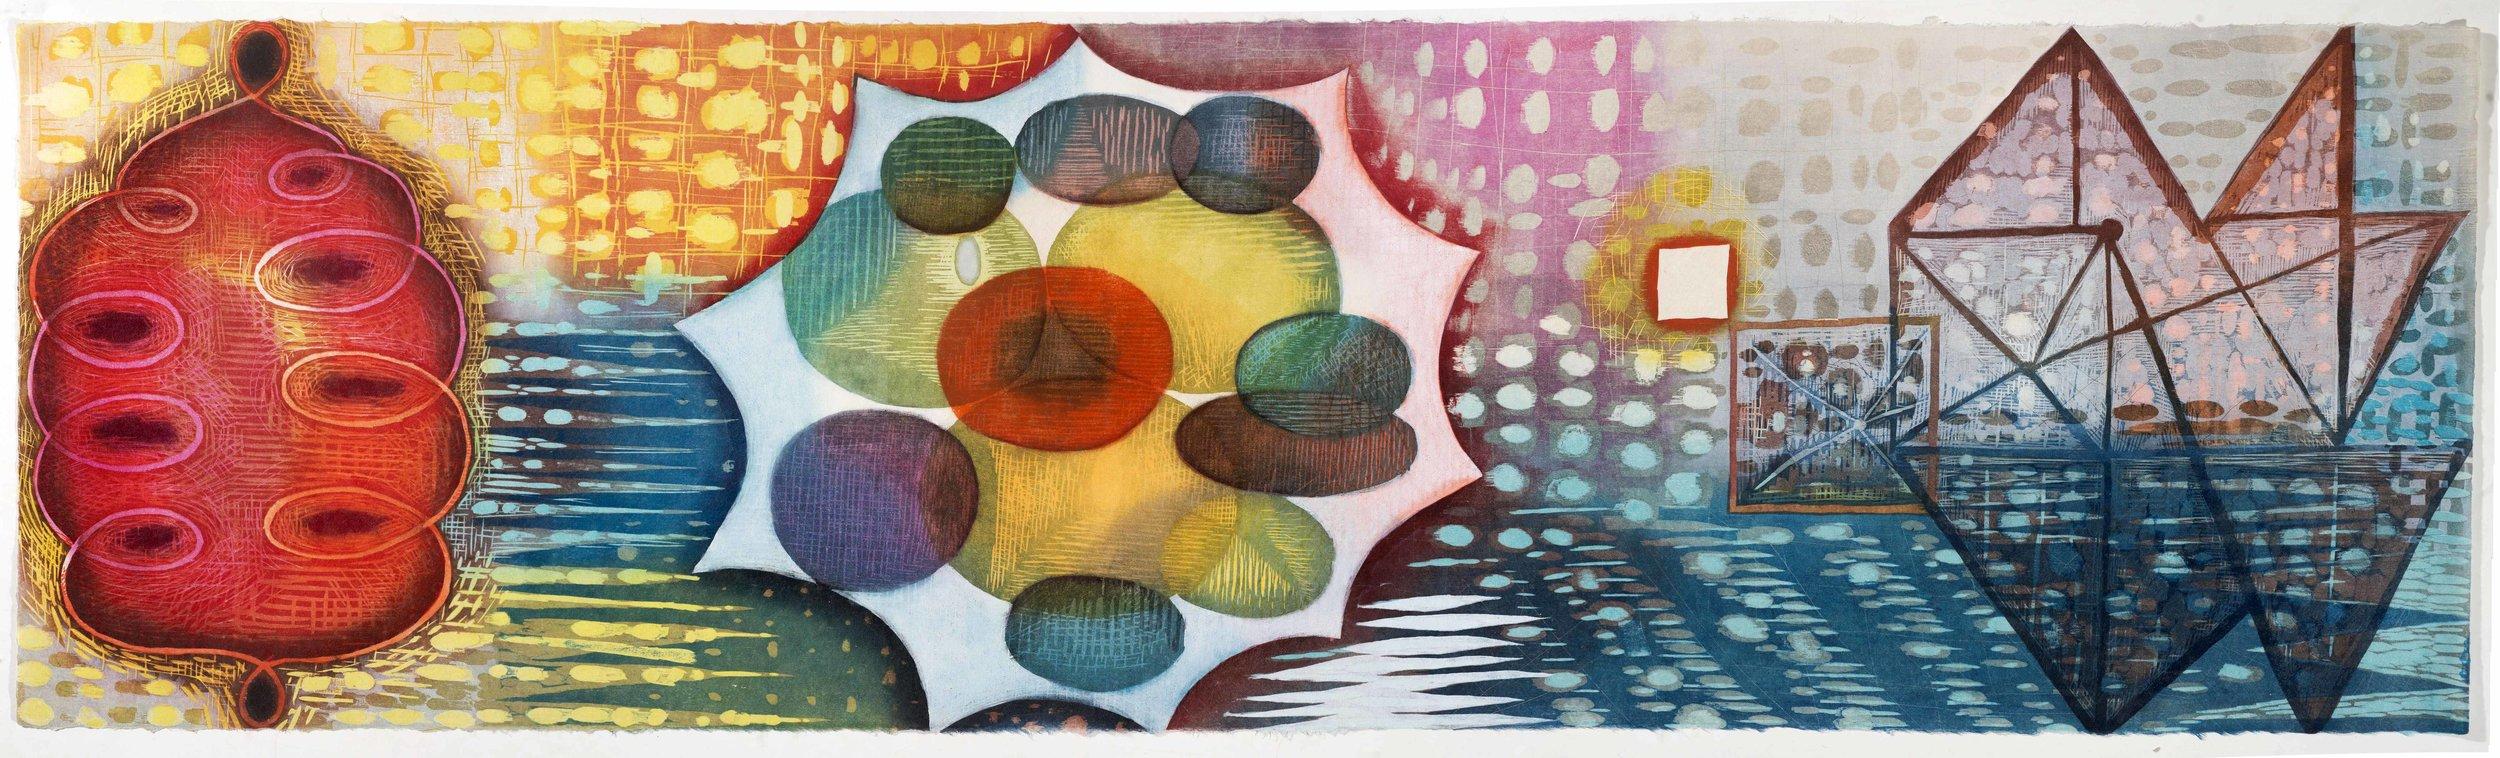 "Karen Kunc  (BIO)    Persian Flower , 2014  woodcut  25"" x 64"""